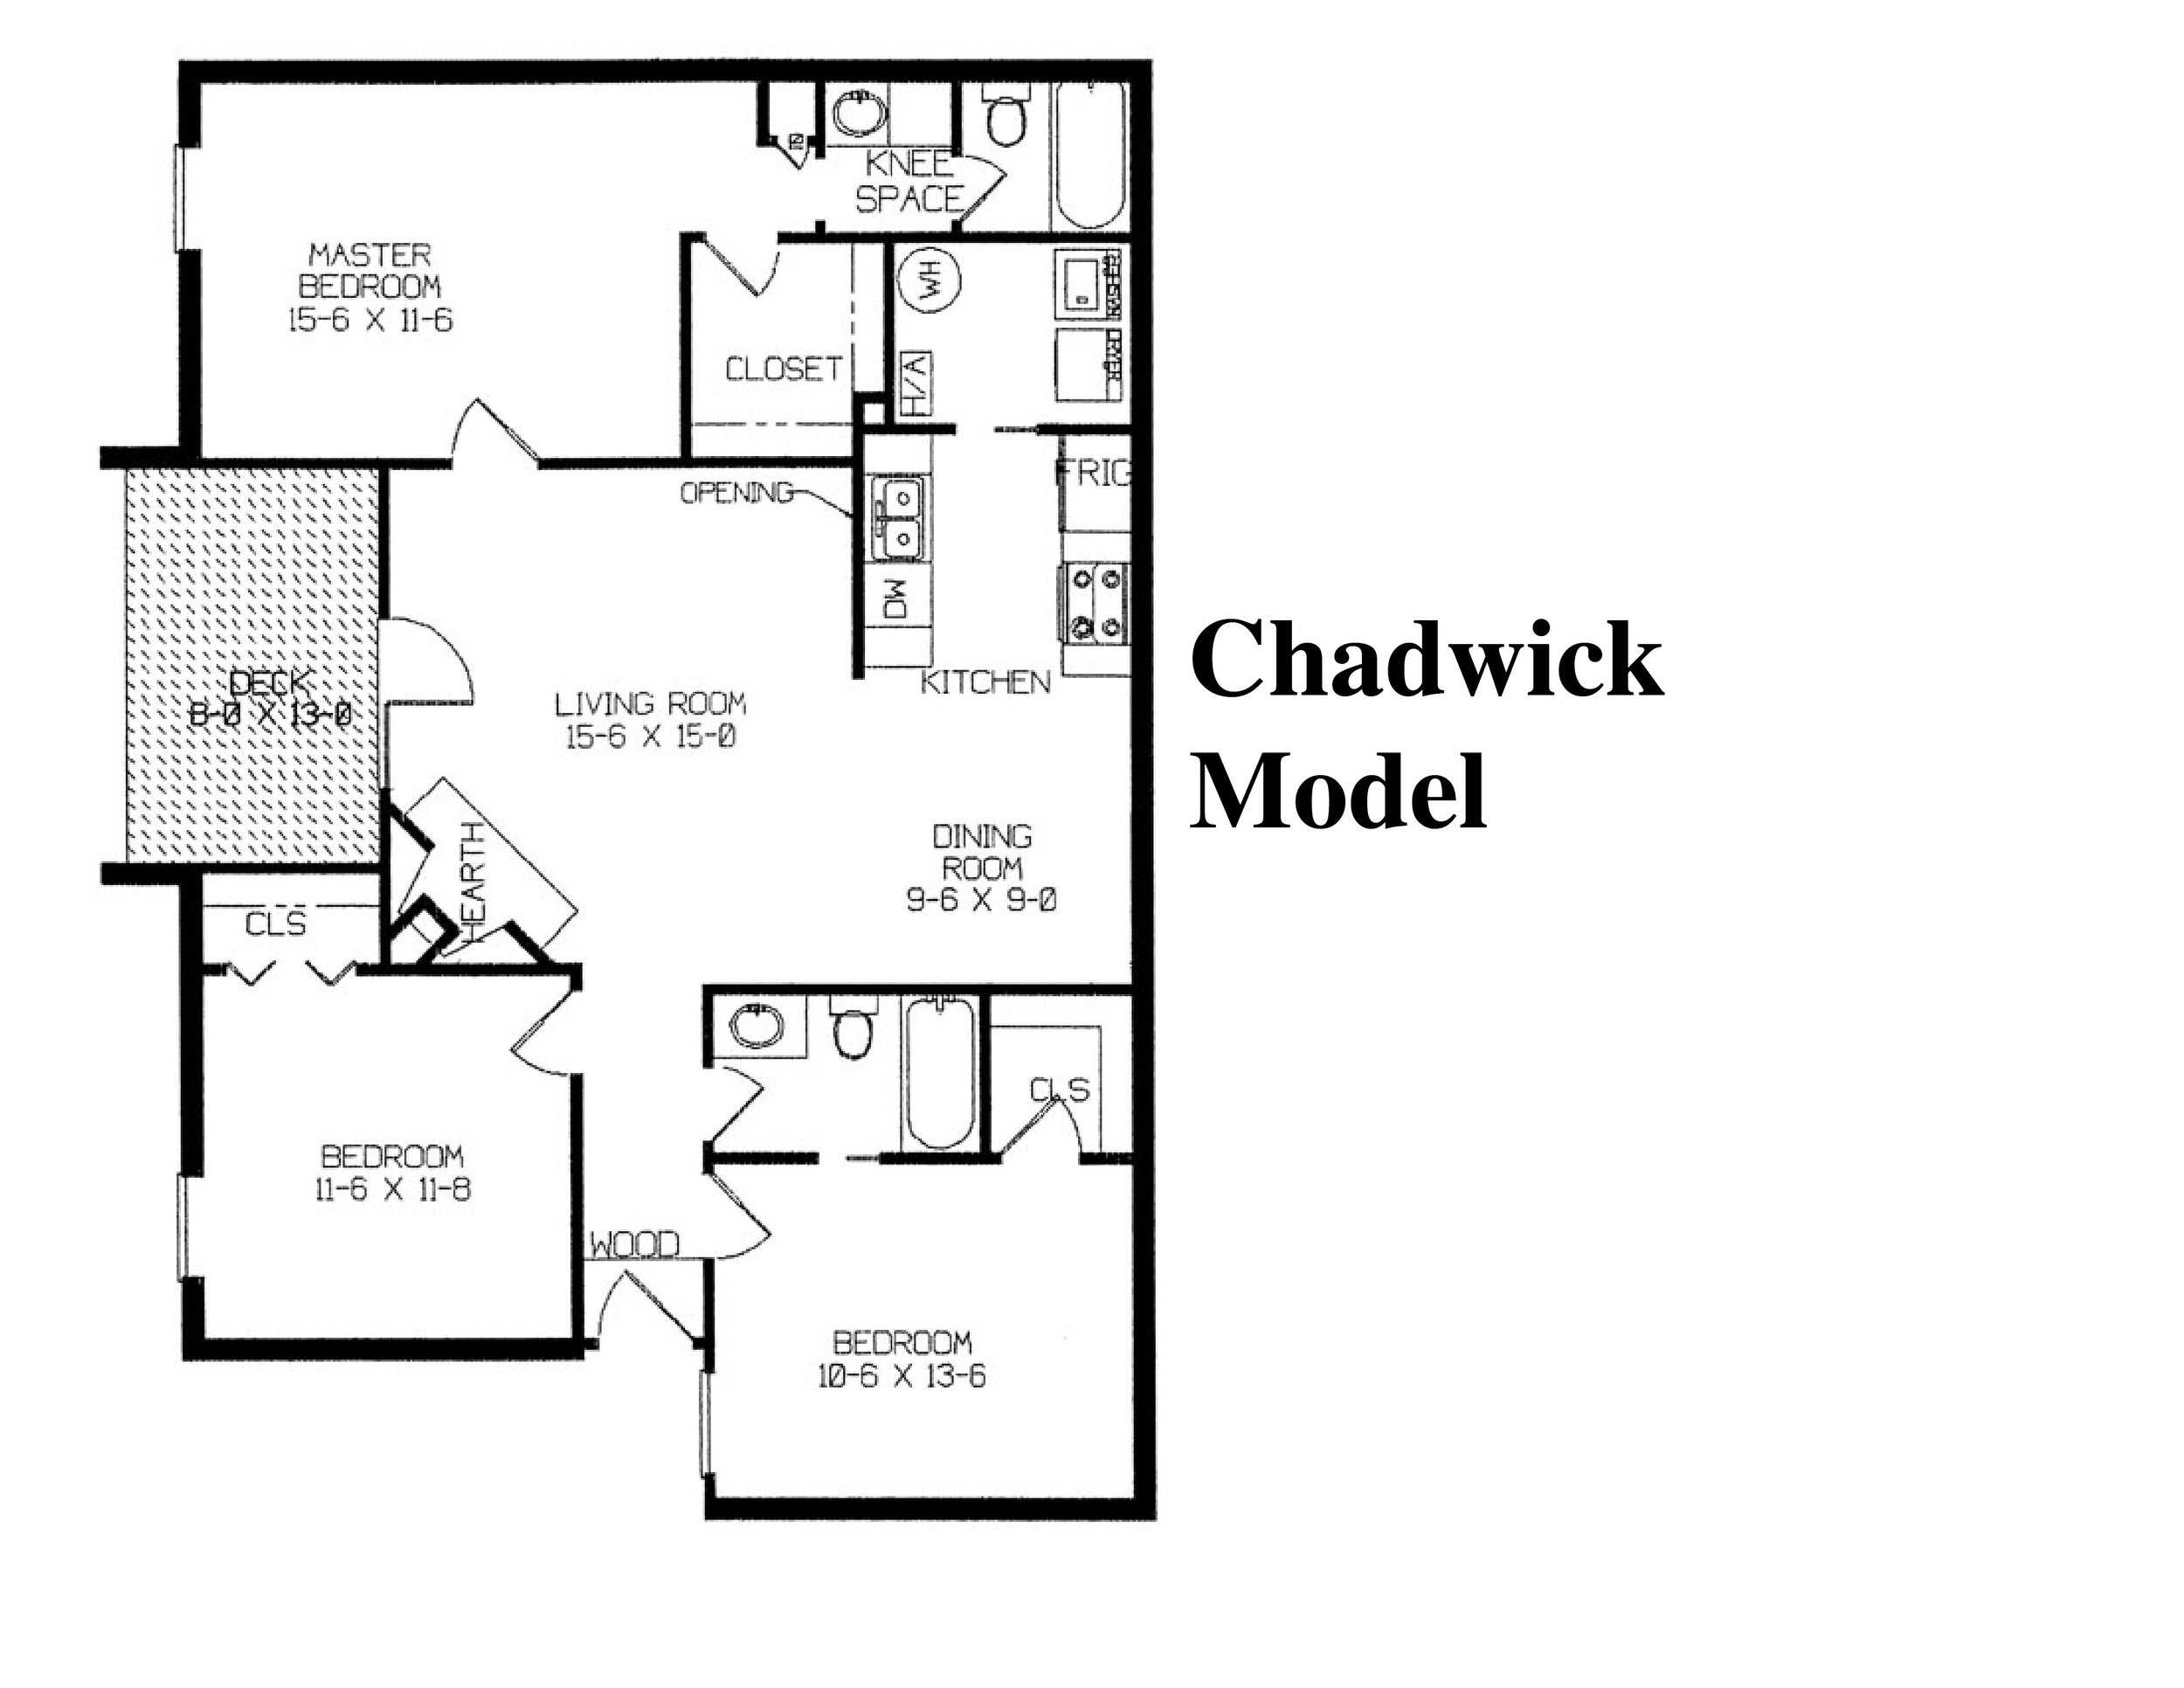 Chadwick Floorplan edited.jpg